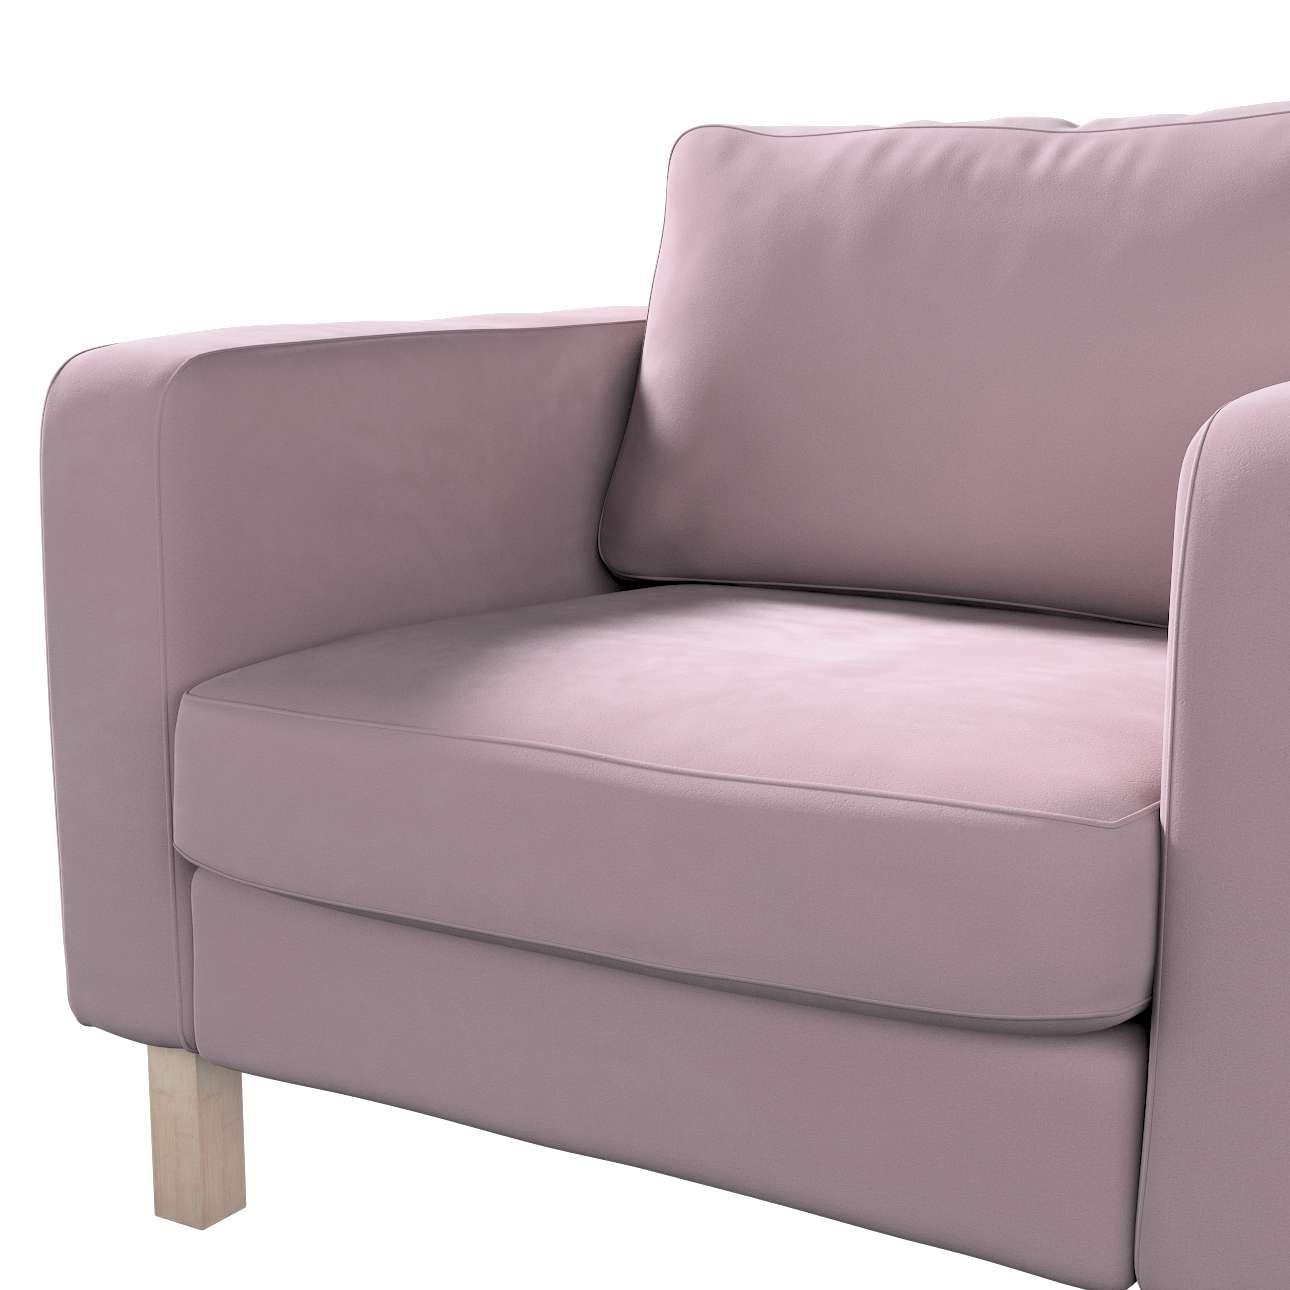 Pokrowiec na fotel Karlstad, krótki w kolekcji Velvet, tkanina: 704-14